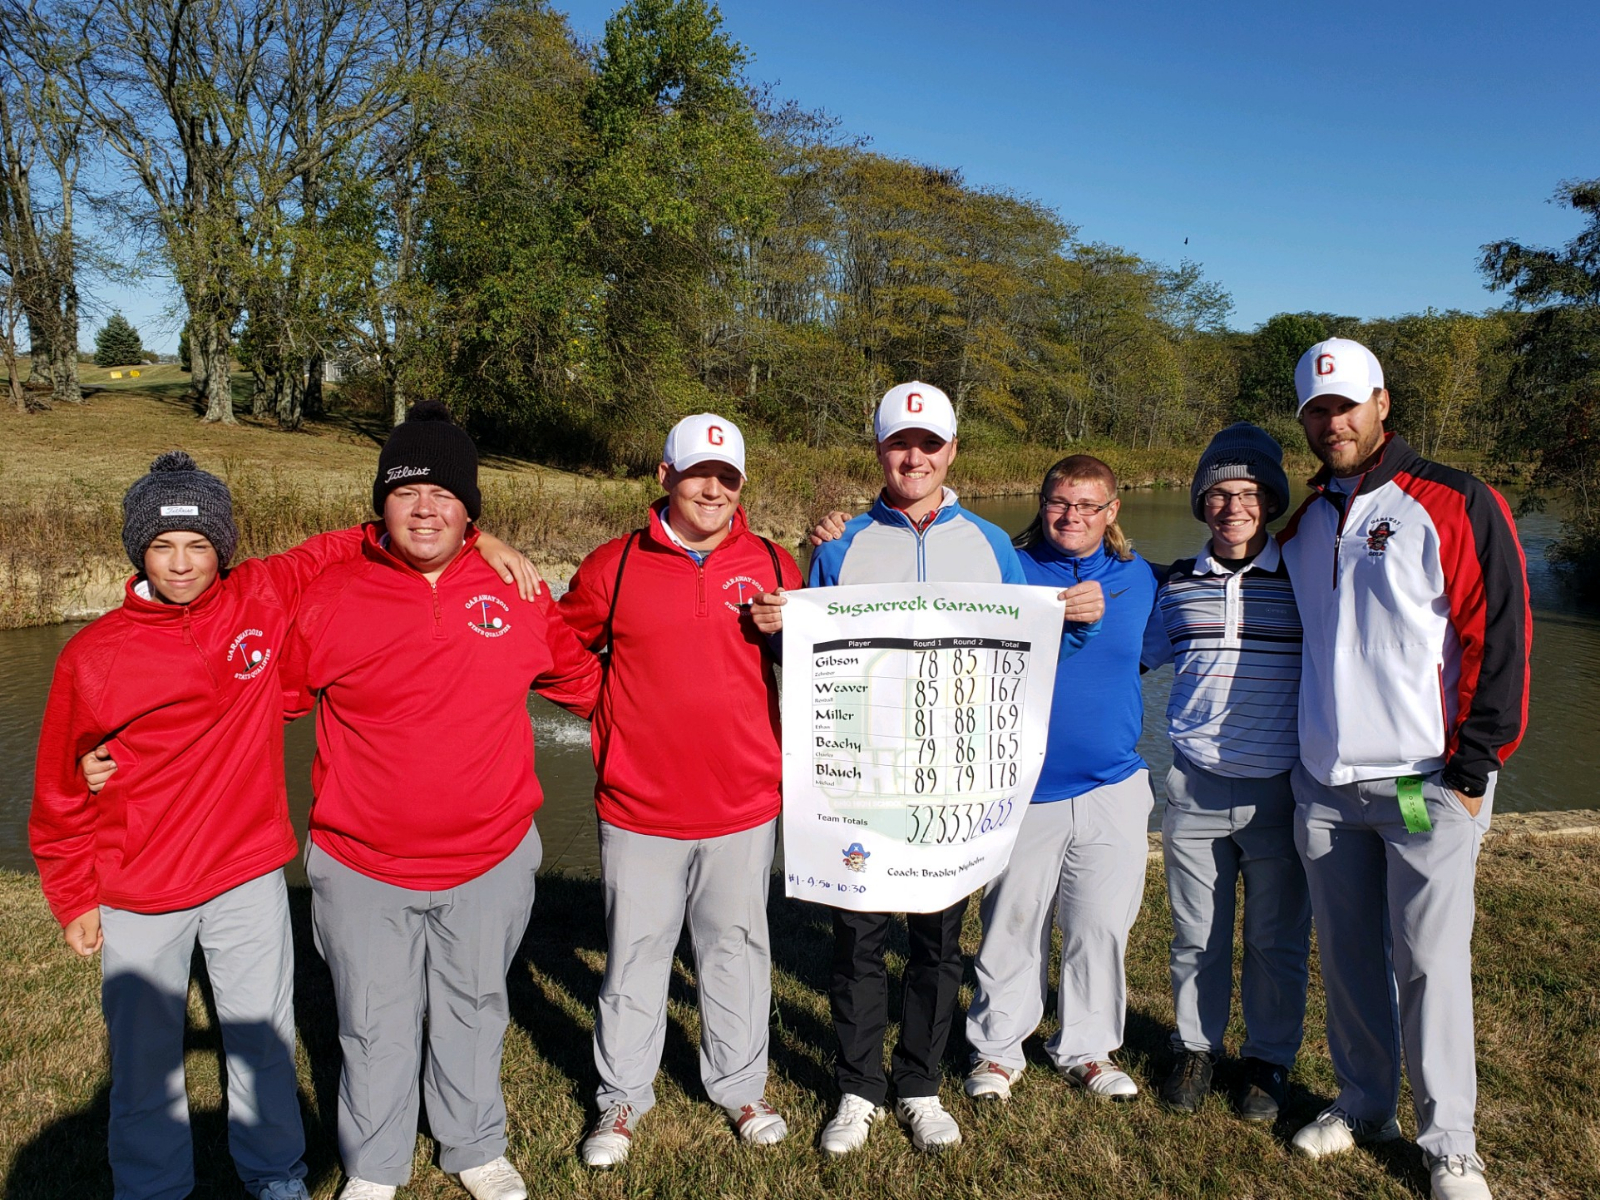 Garaway Boys Golf 3rd at Div.2 State Golf